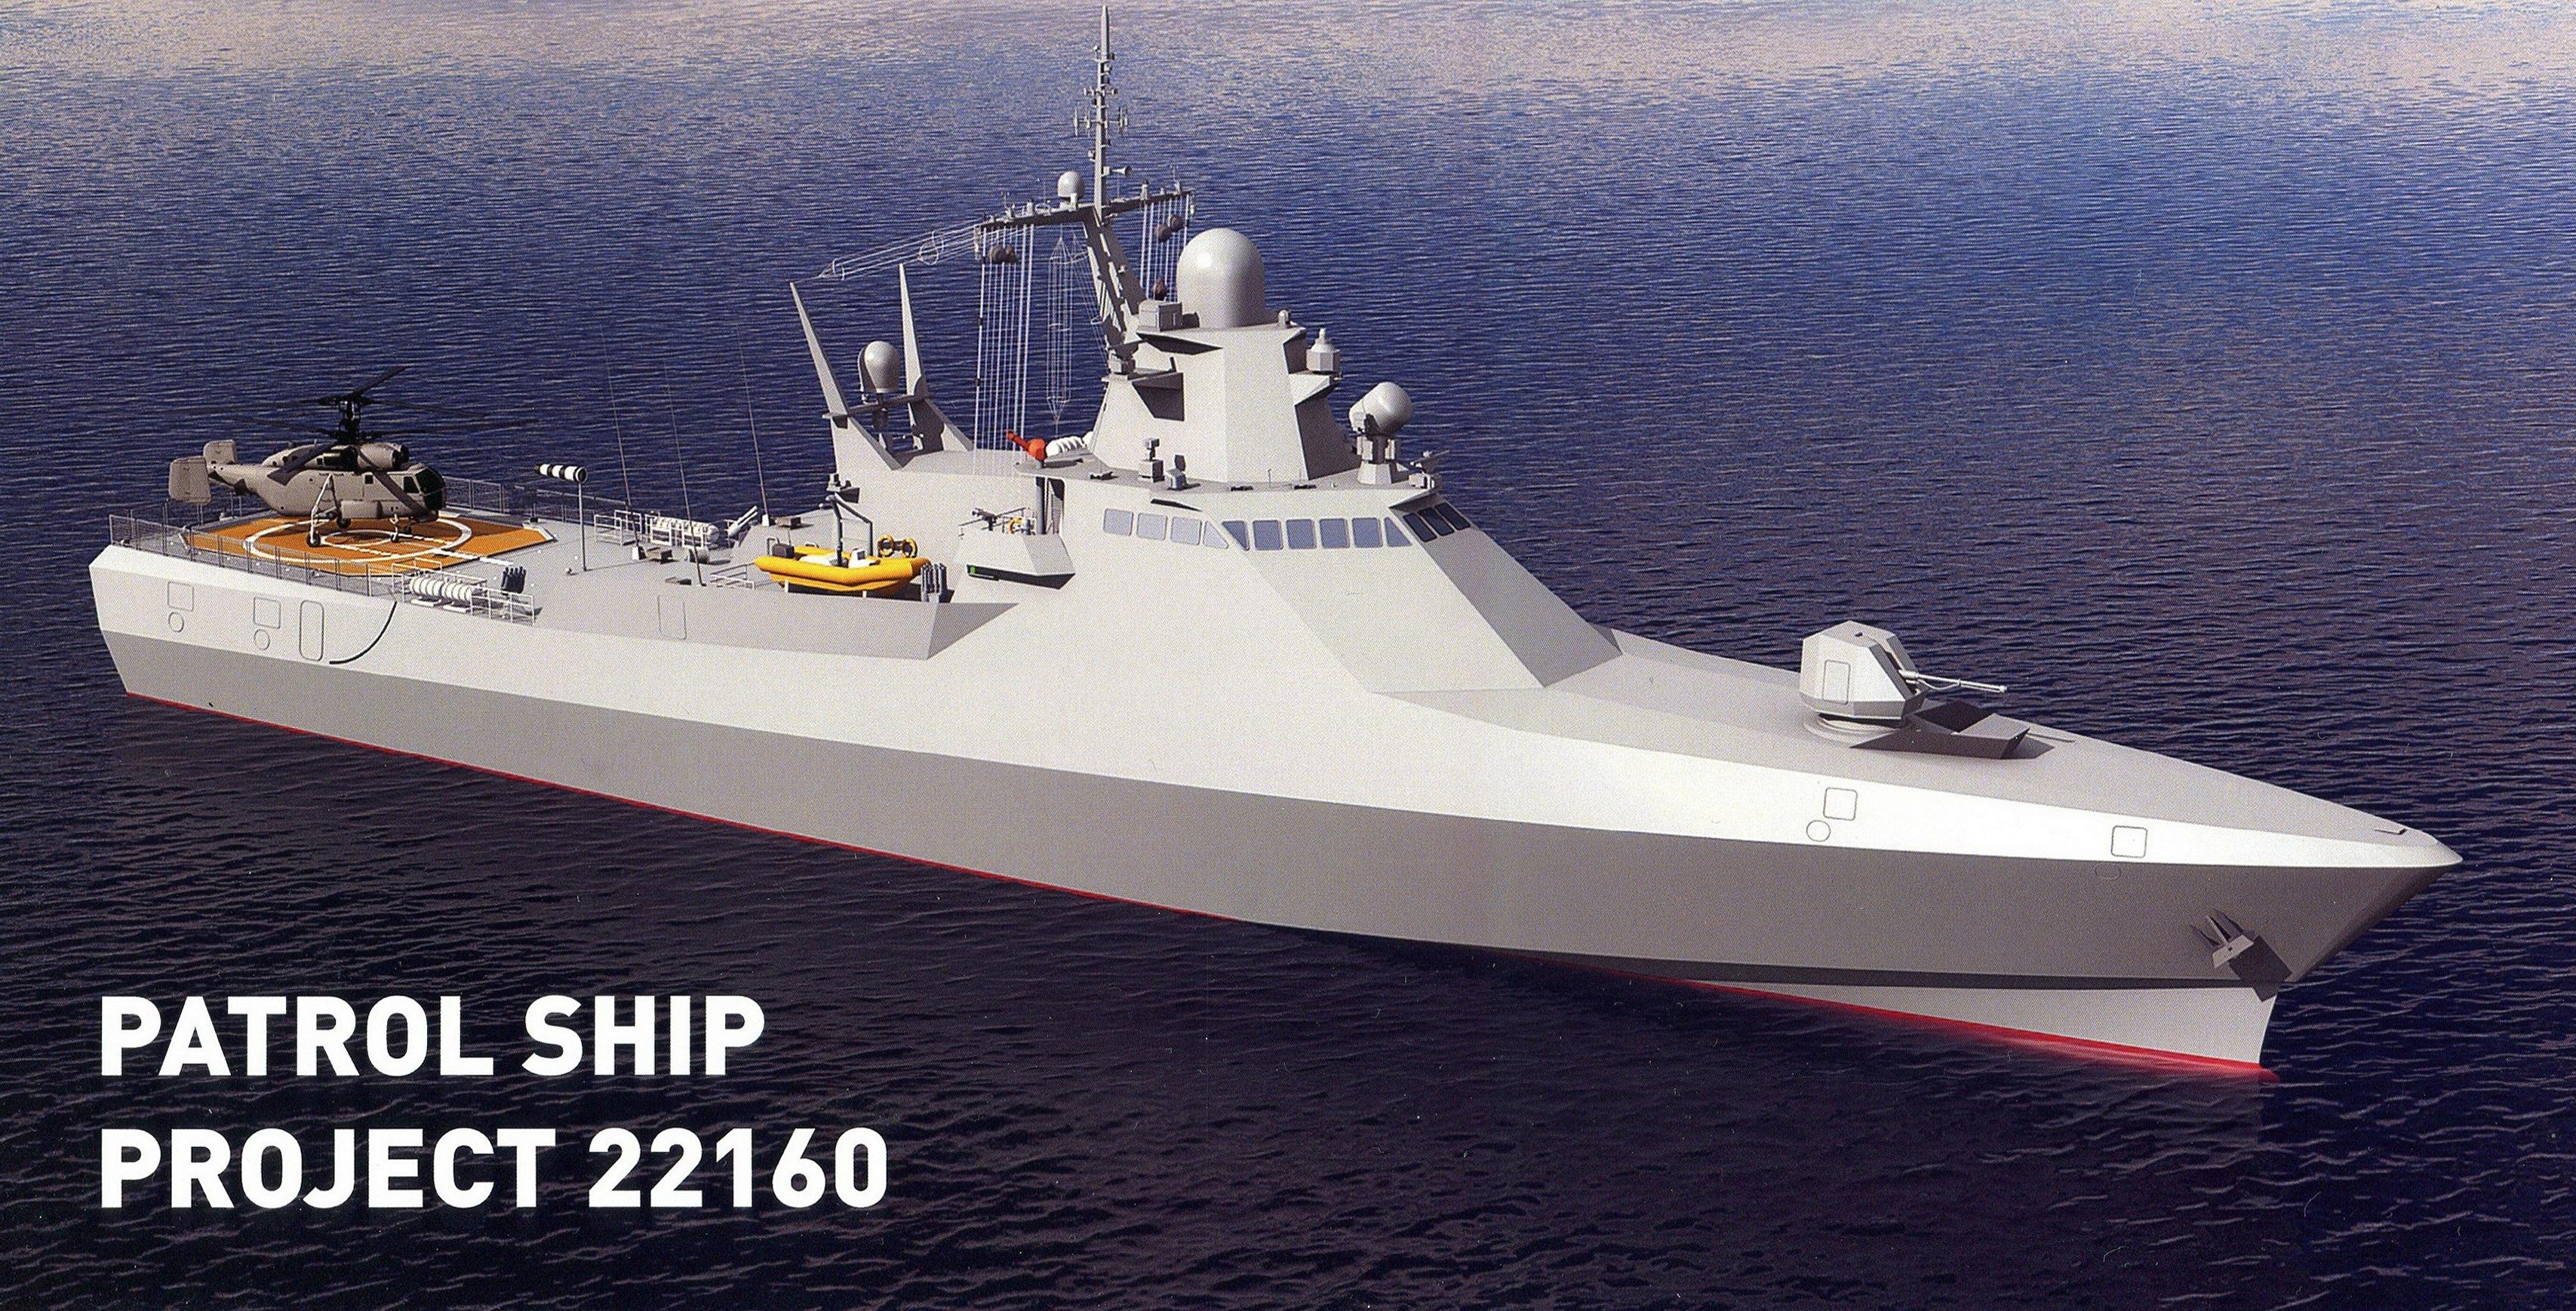 Project 22160 Bykov-class patrol ship - Page 5 18-4214634-patrol-ship-project-22160